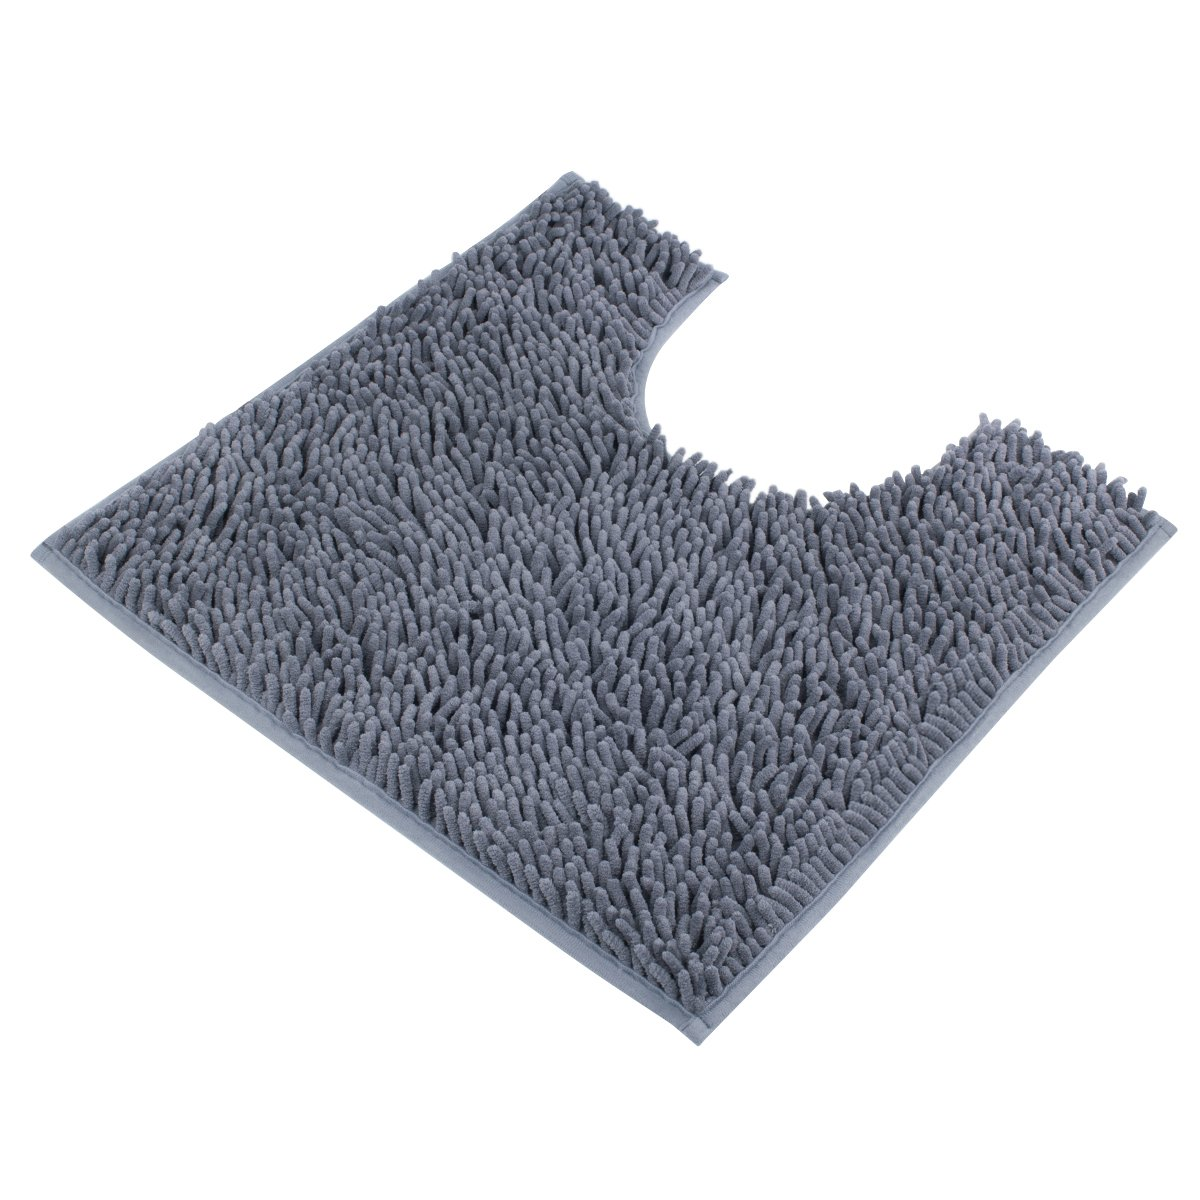 vdomus contour bath rug soft shaggy ushaped toilet floor mat bathroom carpet